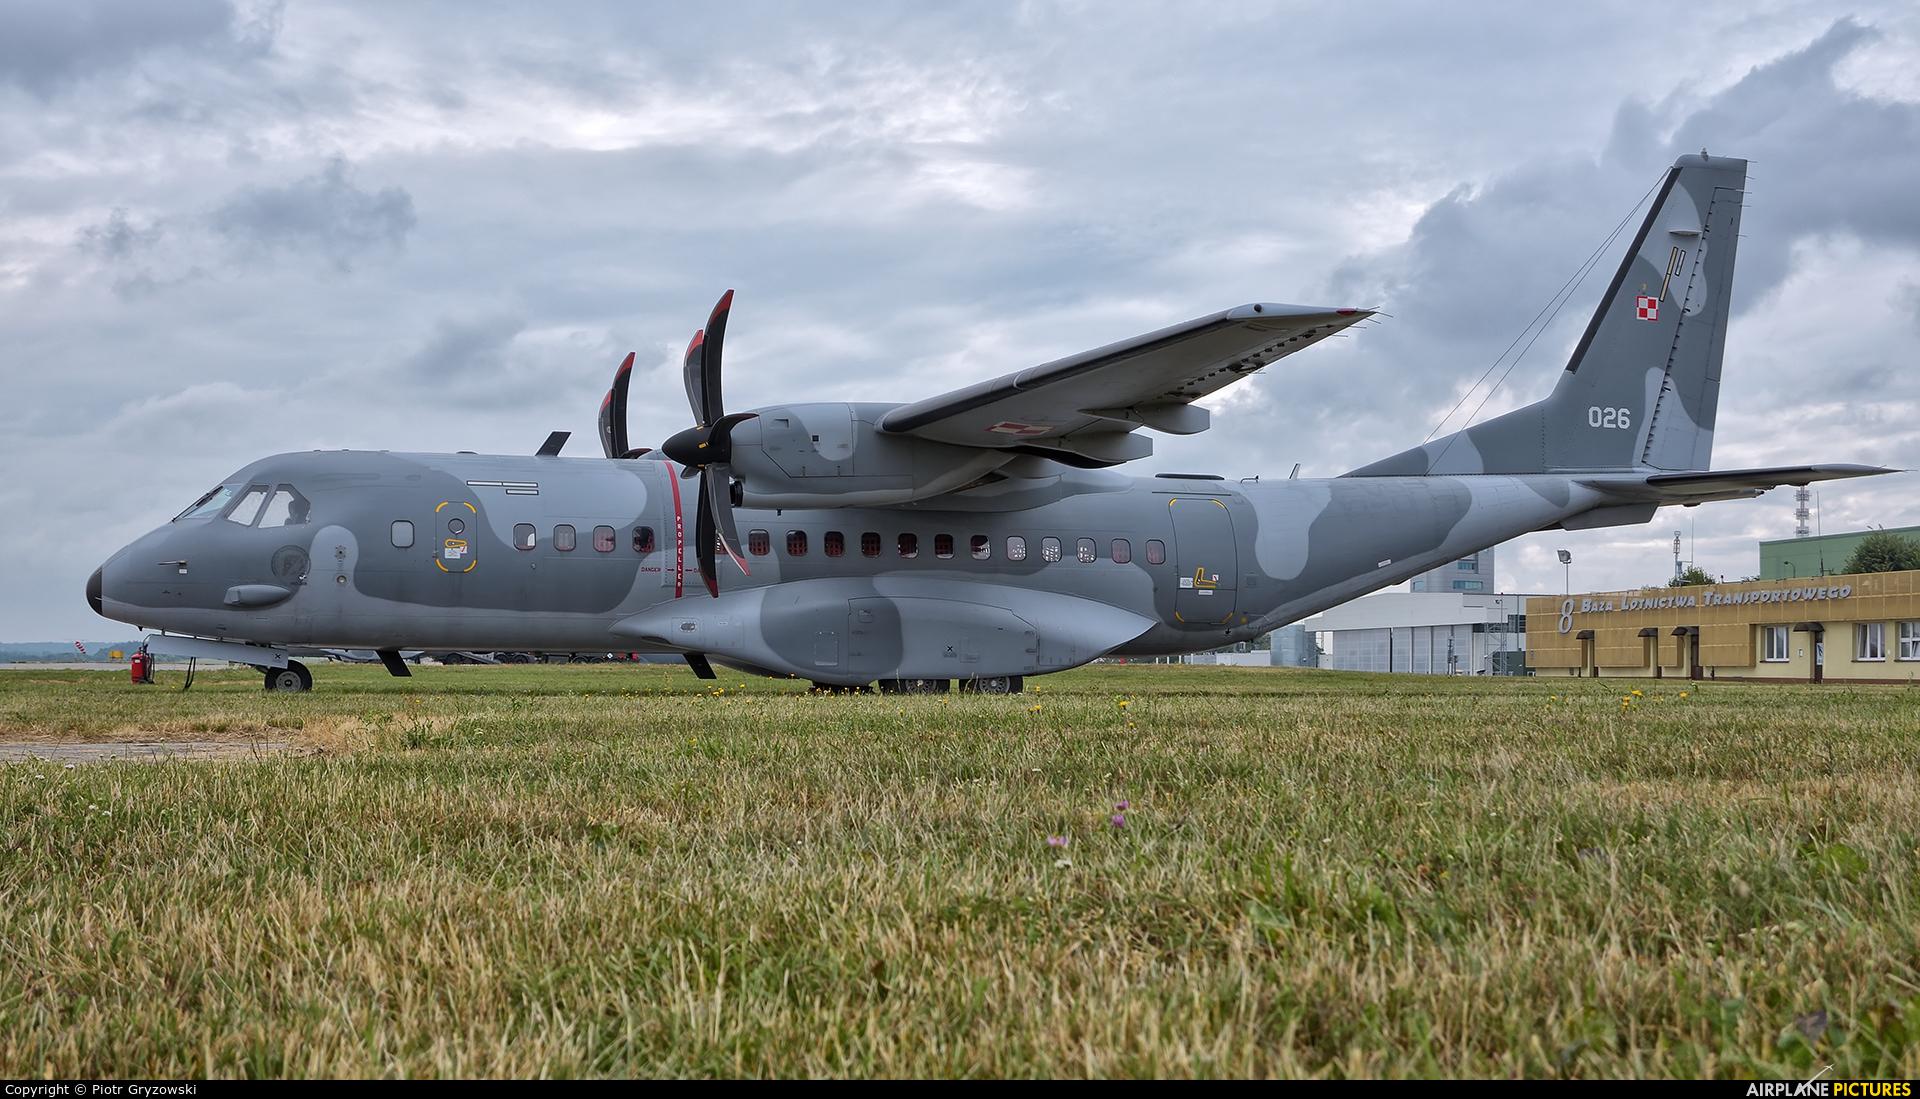 Poland - Air Force 026 aircraft at Kraków - John Paul II Intl